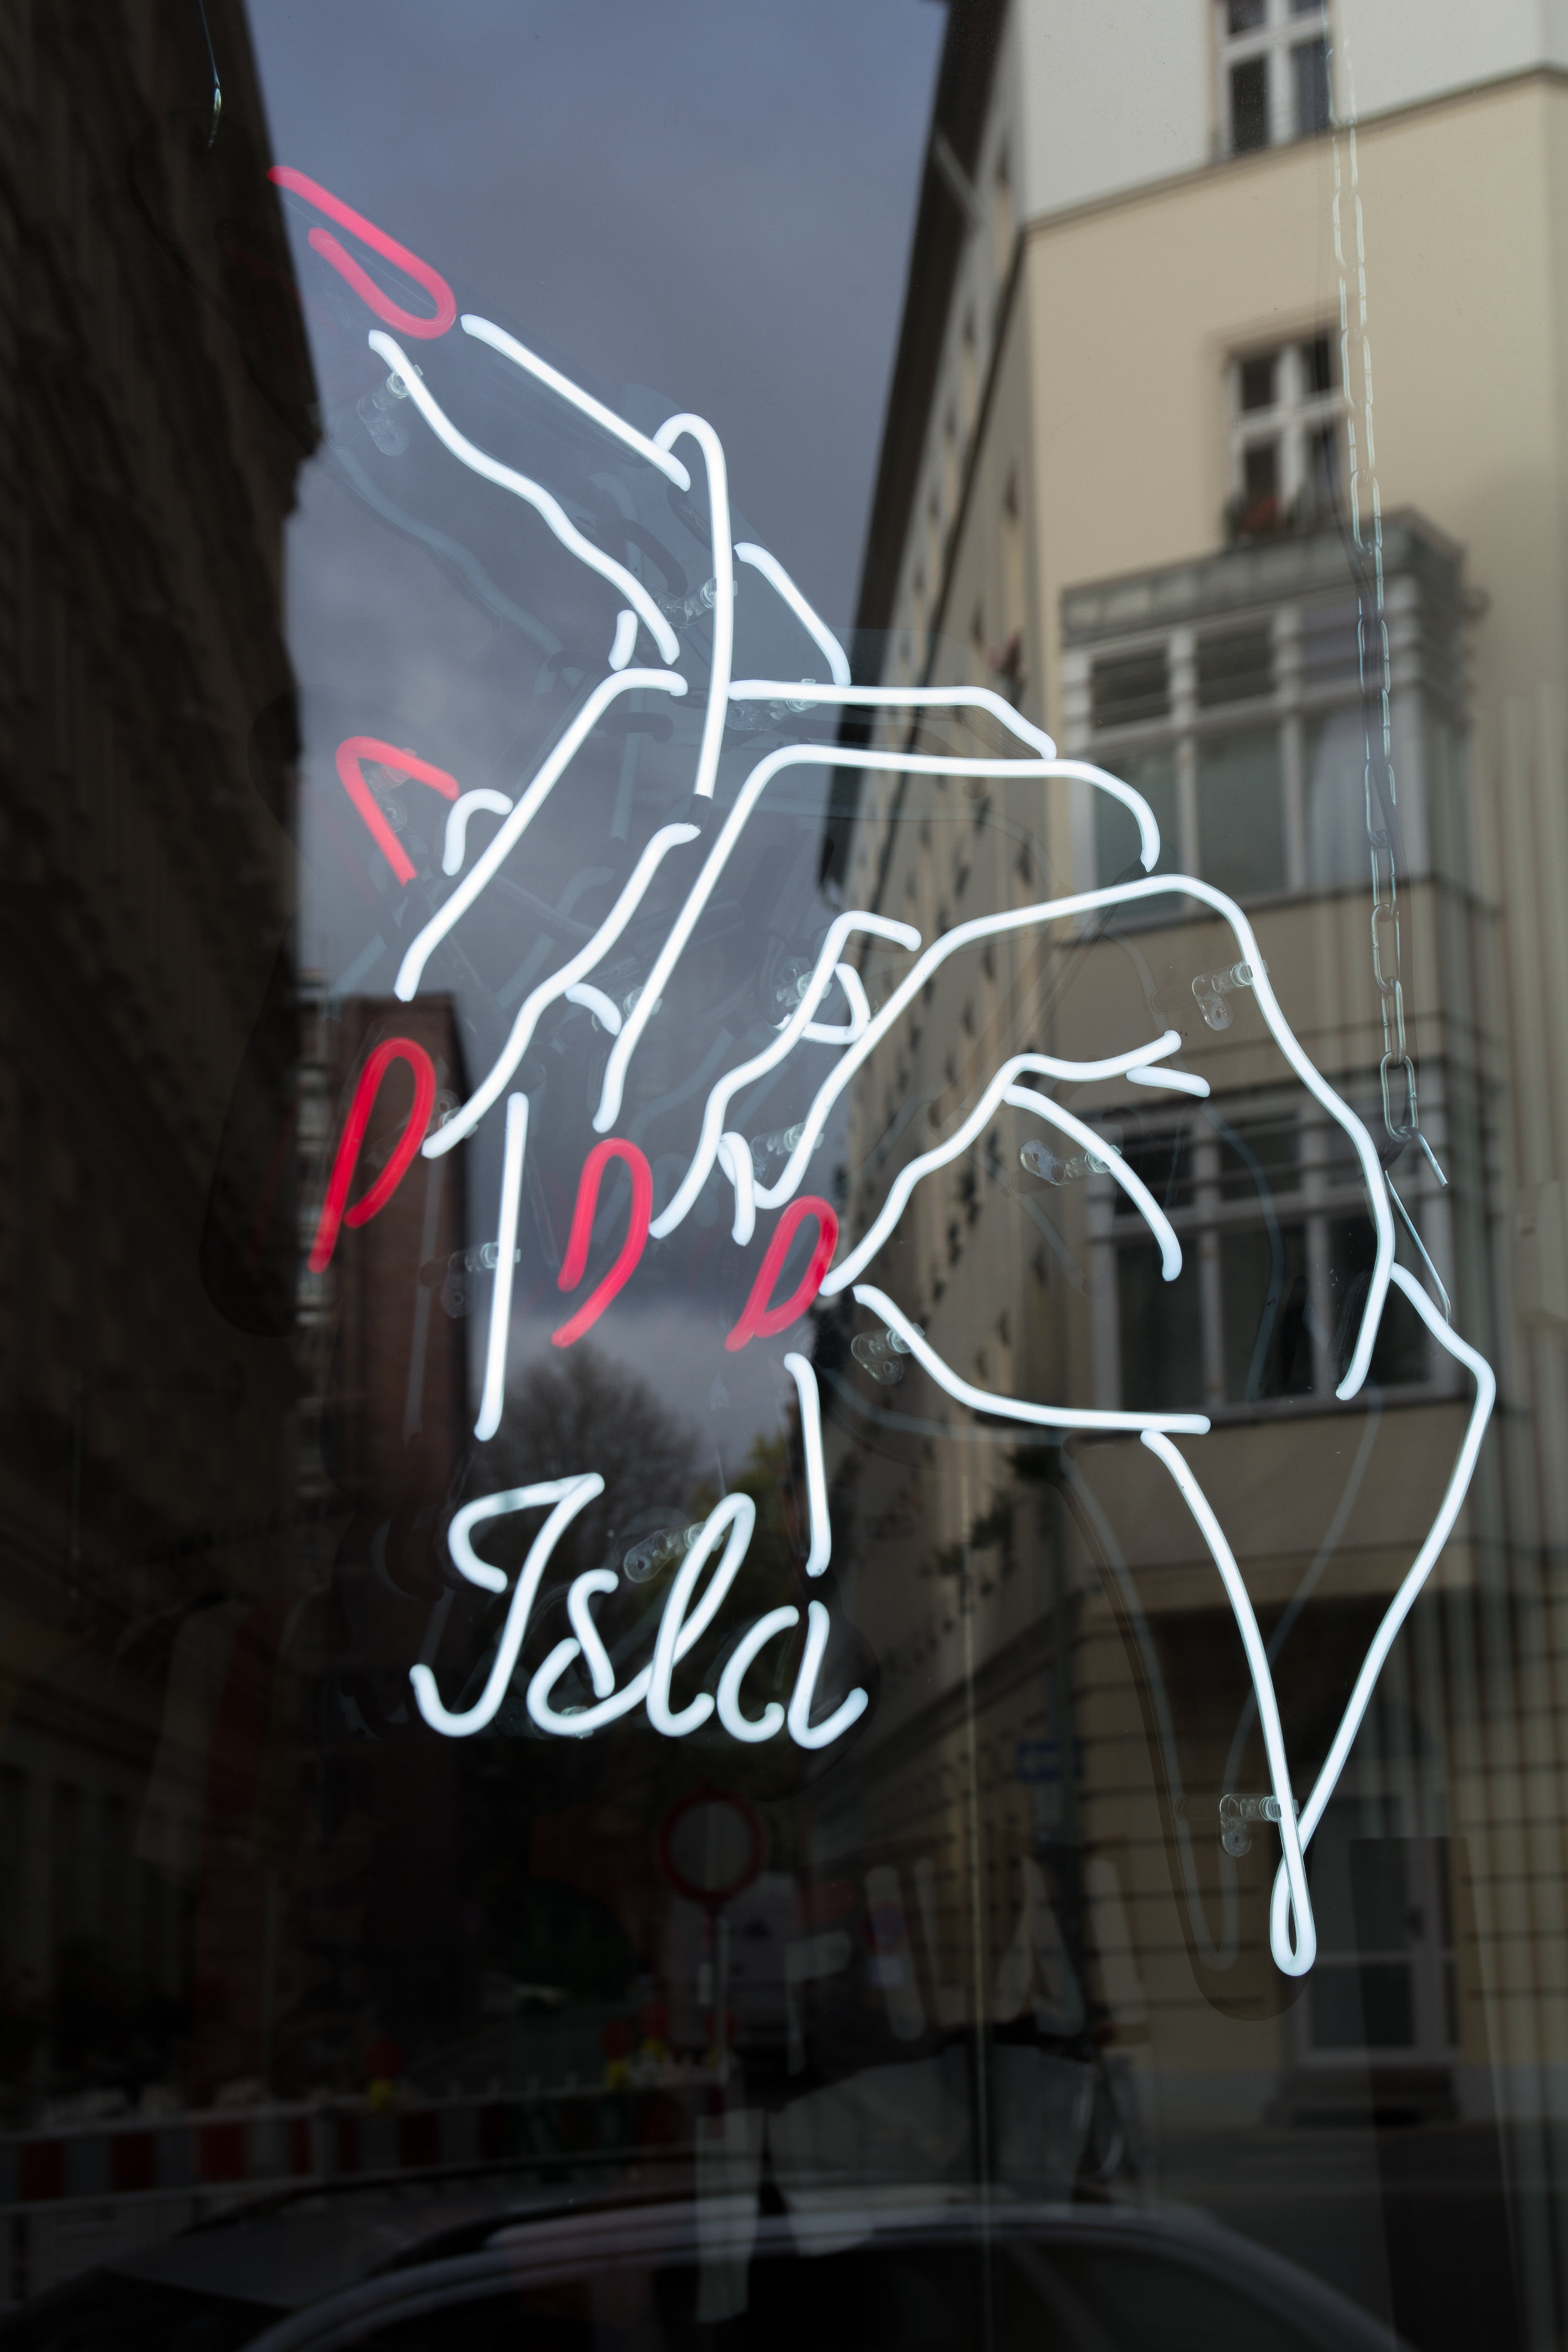 The ISLA logo